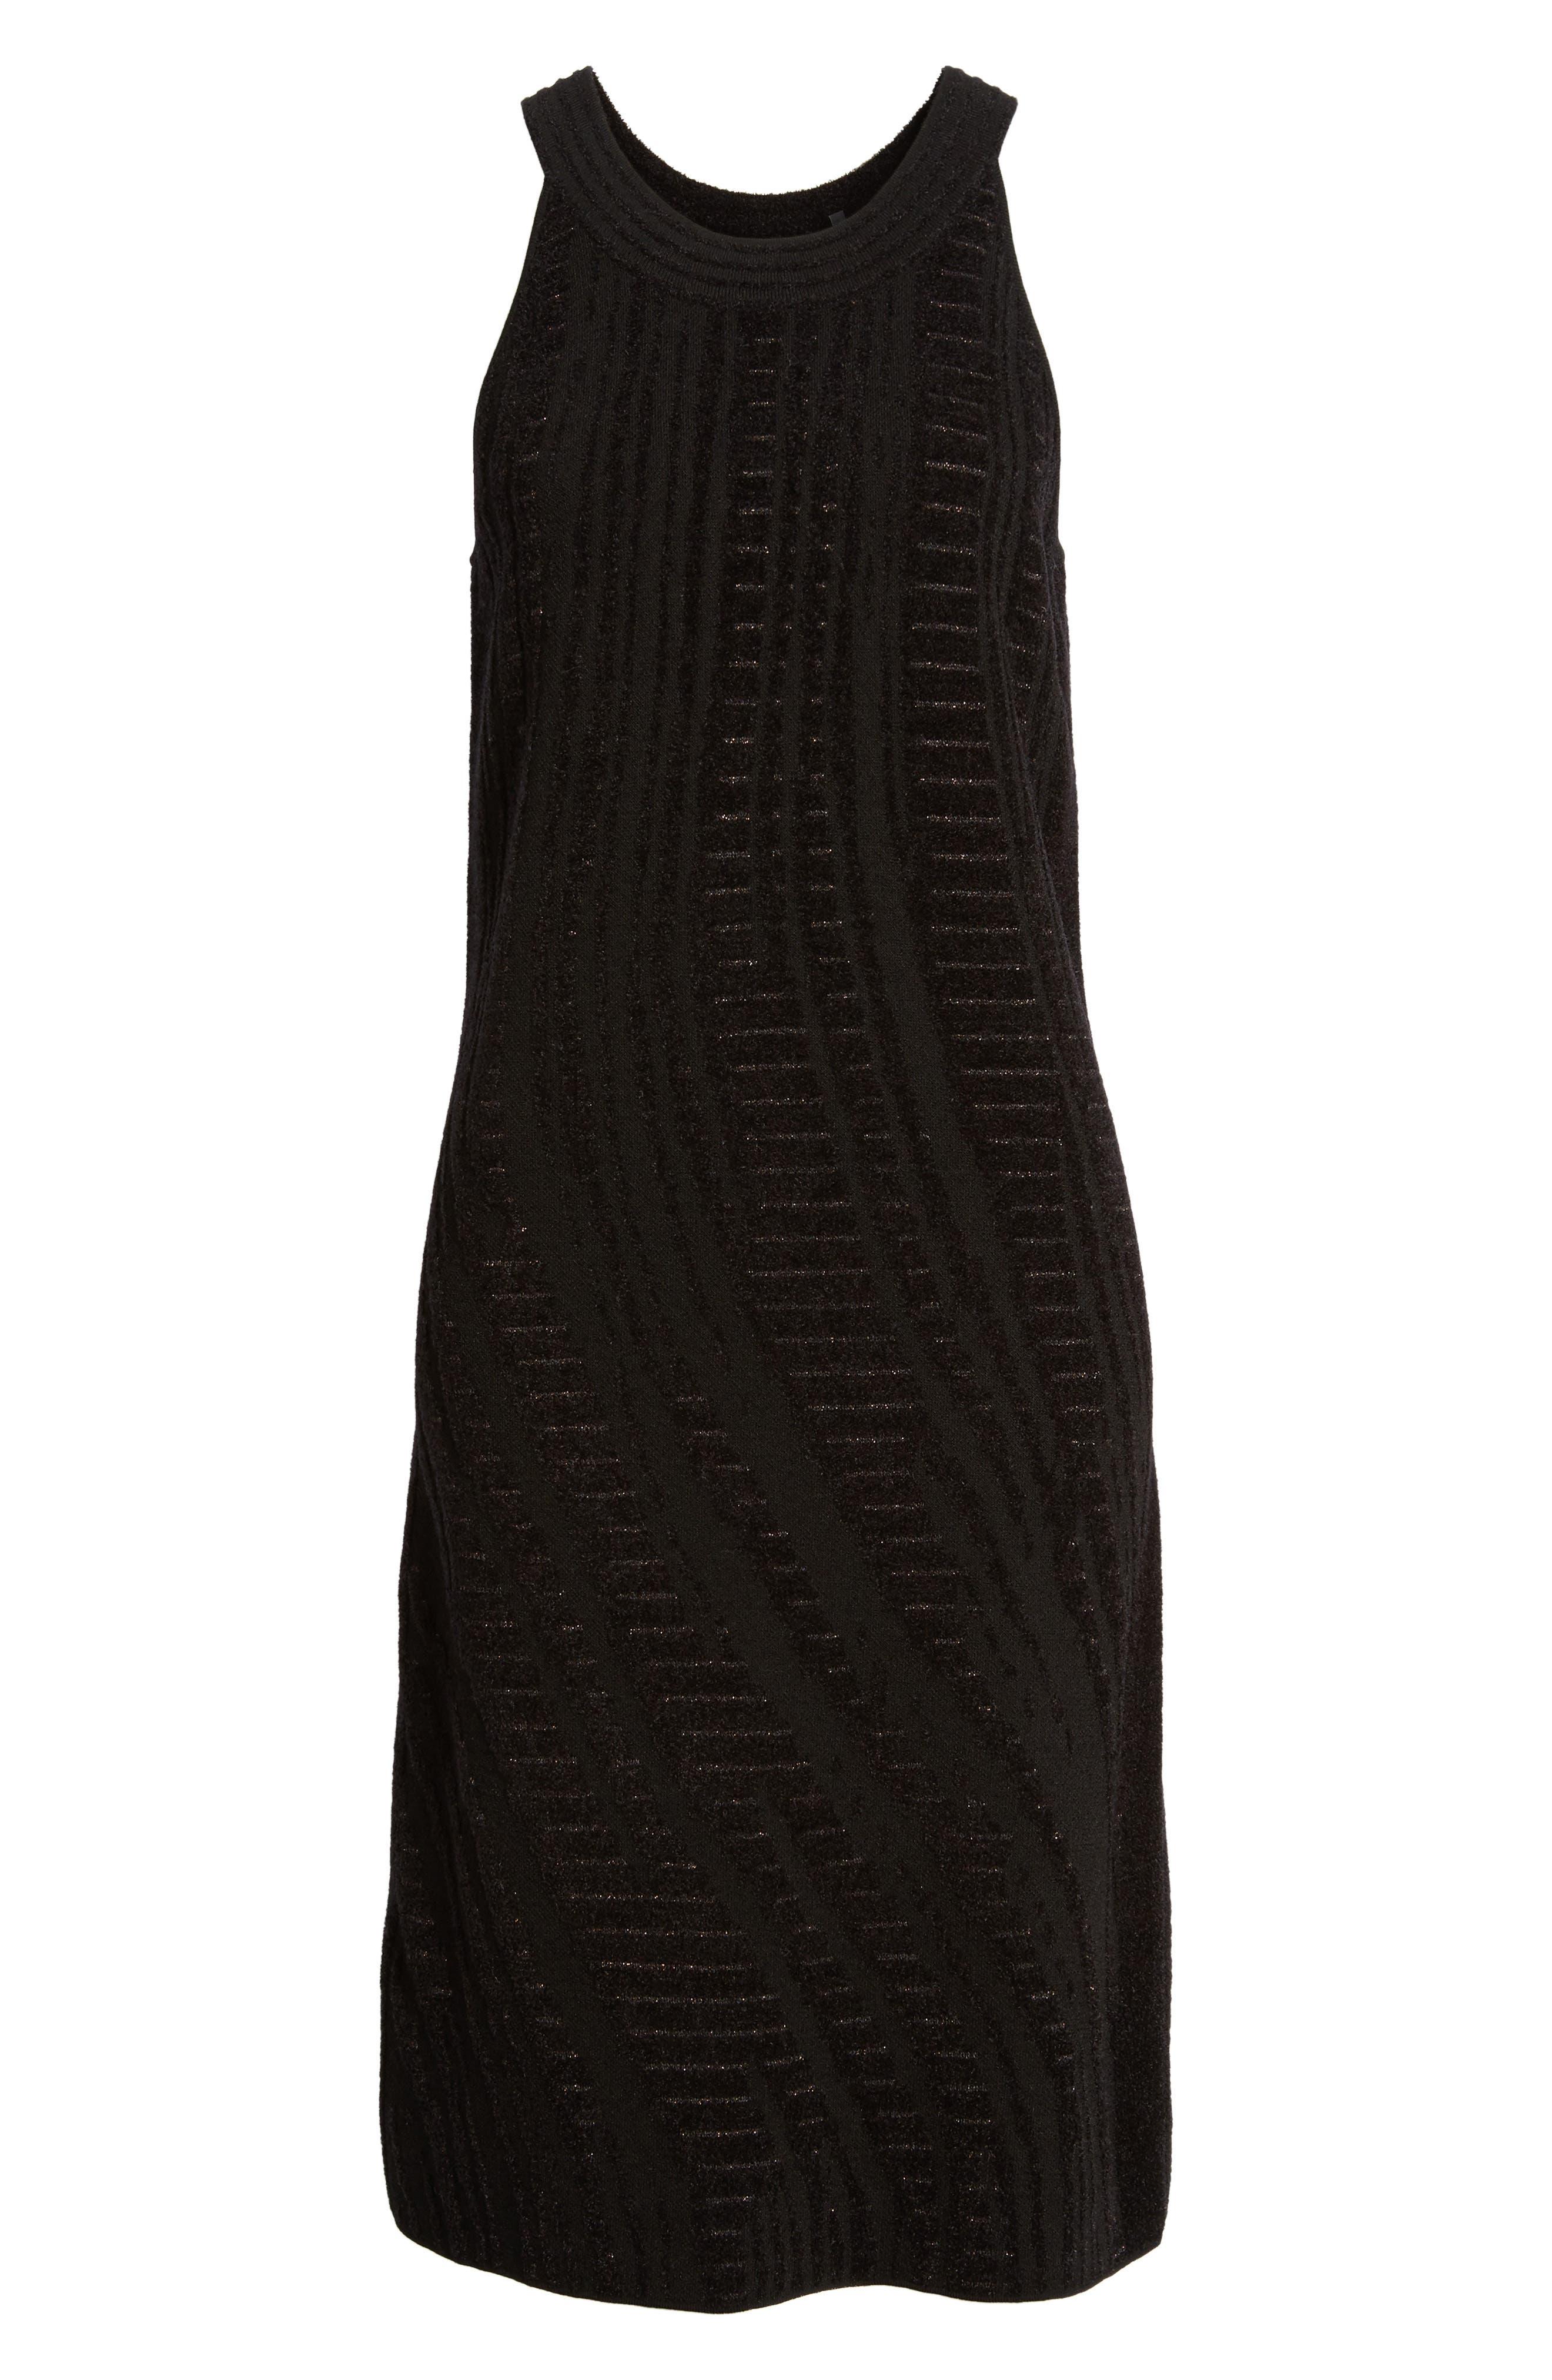 Winter Reign Dress,                             Alternate thumbnail 6, color,                             Black Multi